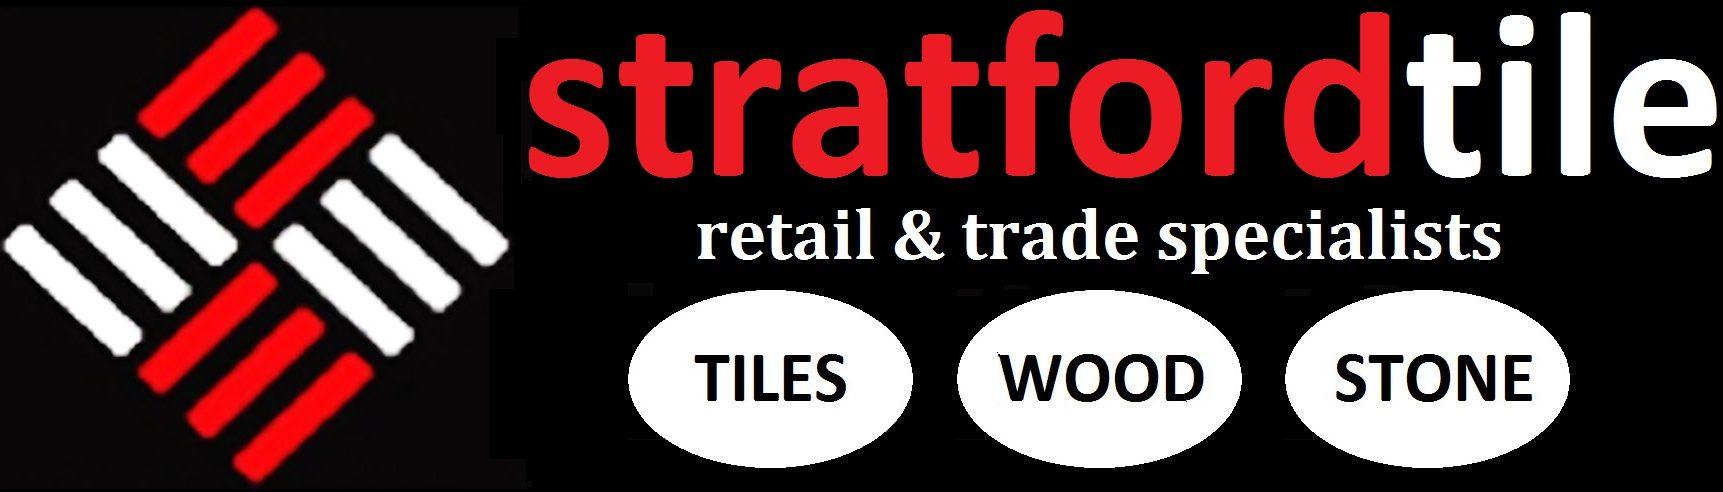 Stratford Tile